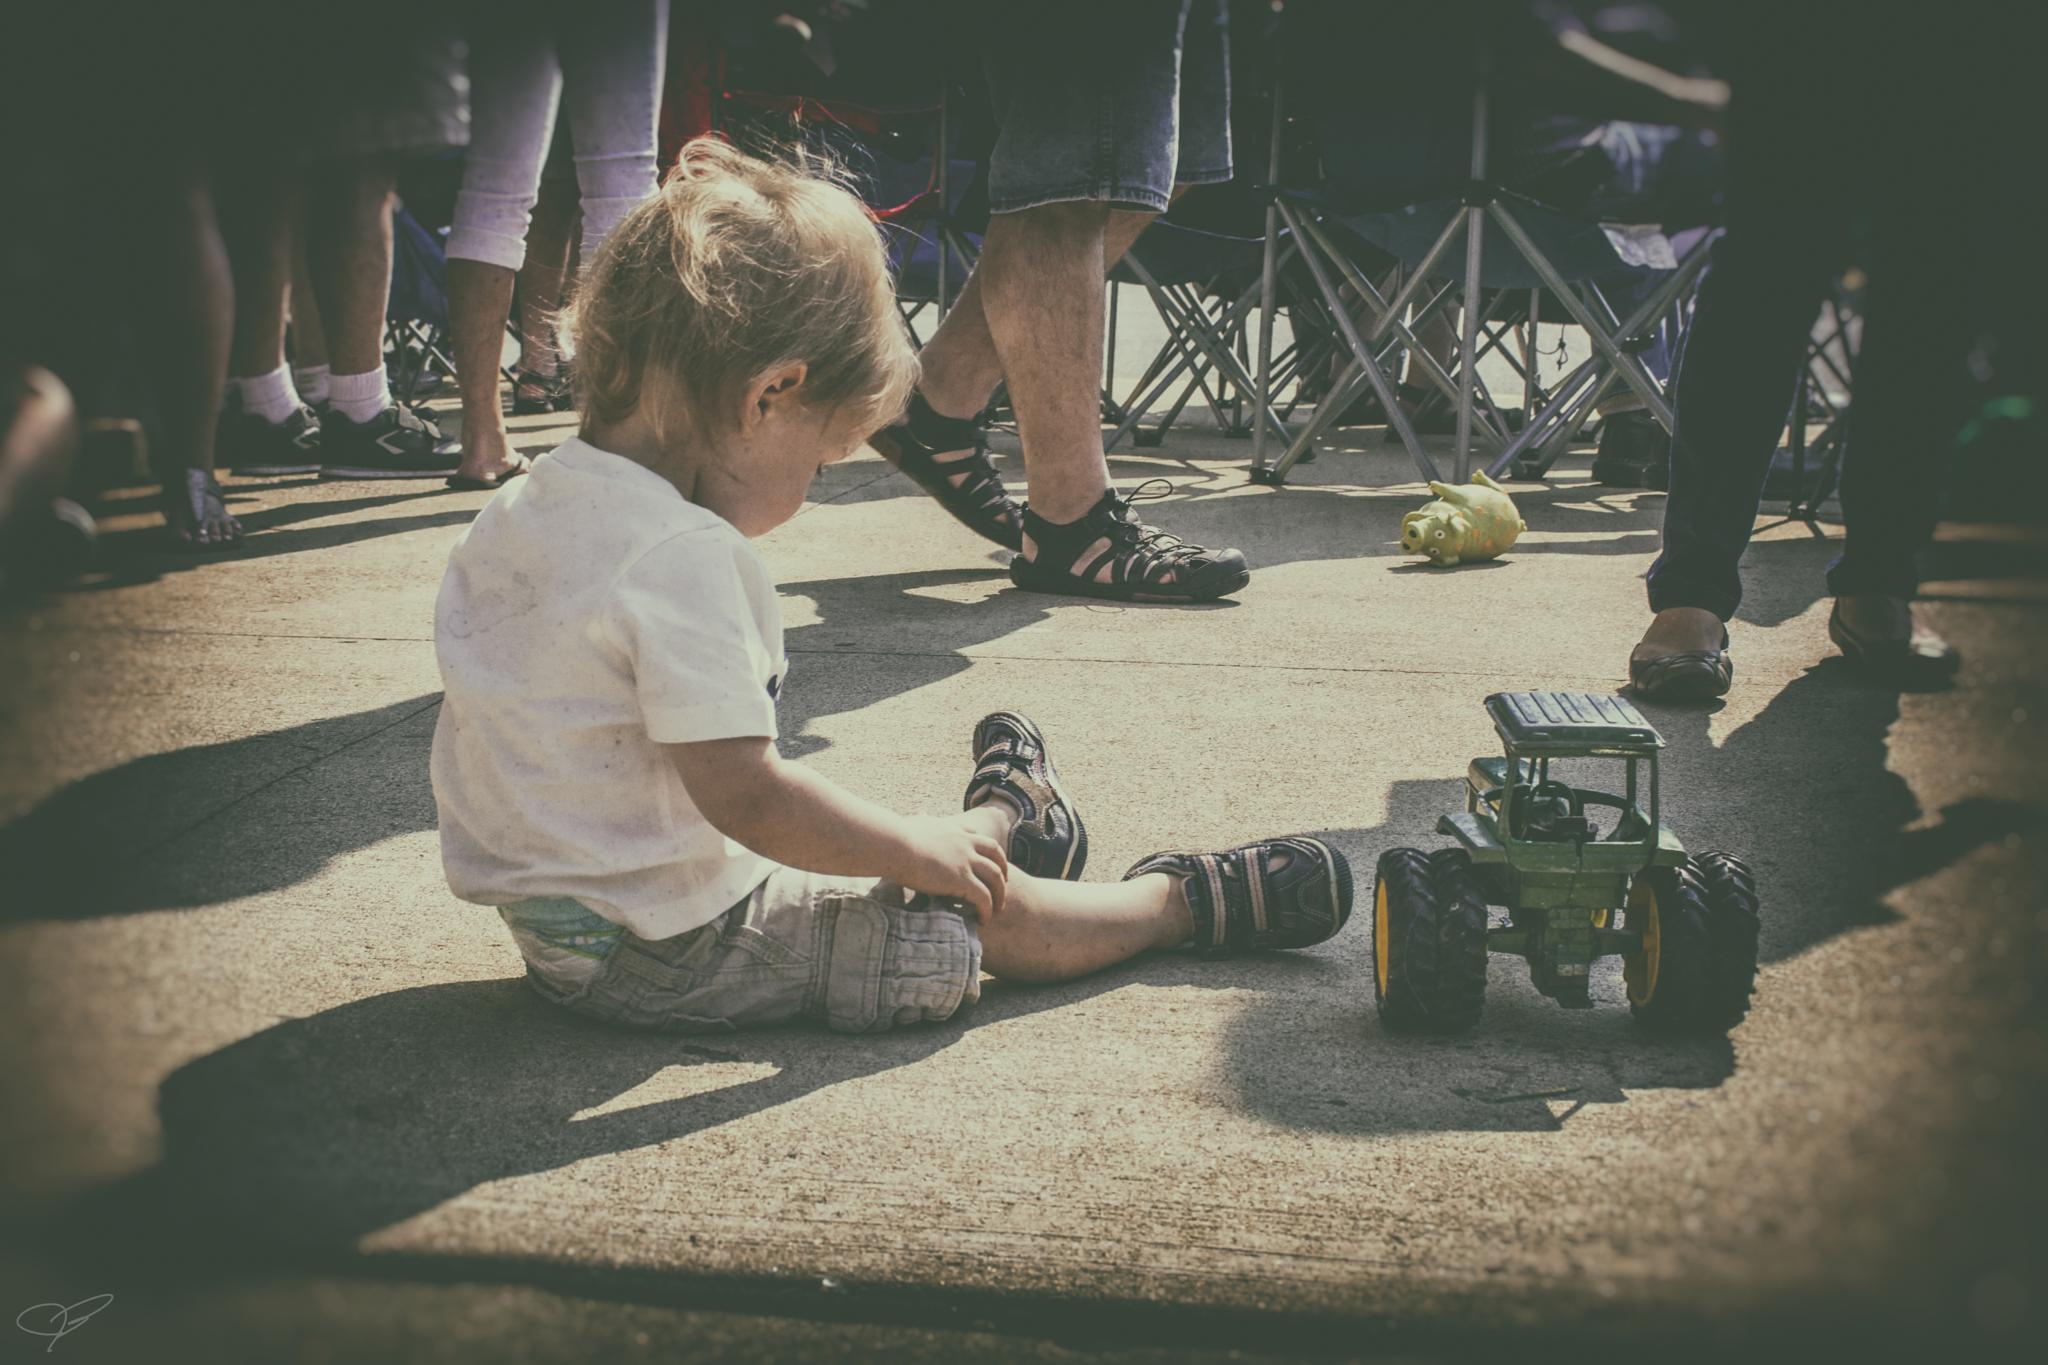 Child by JohnBrake